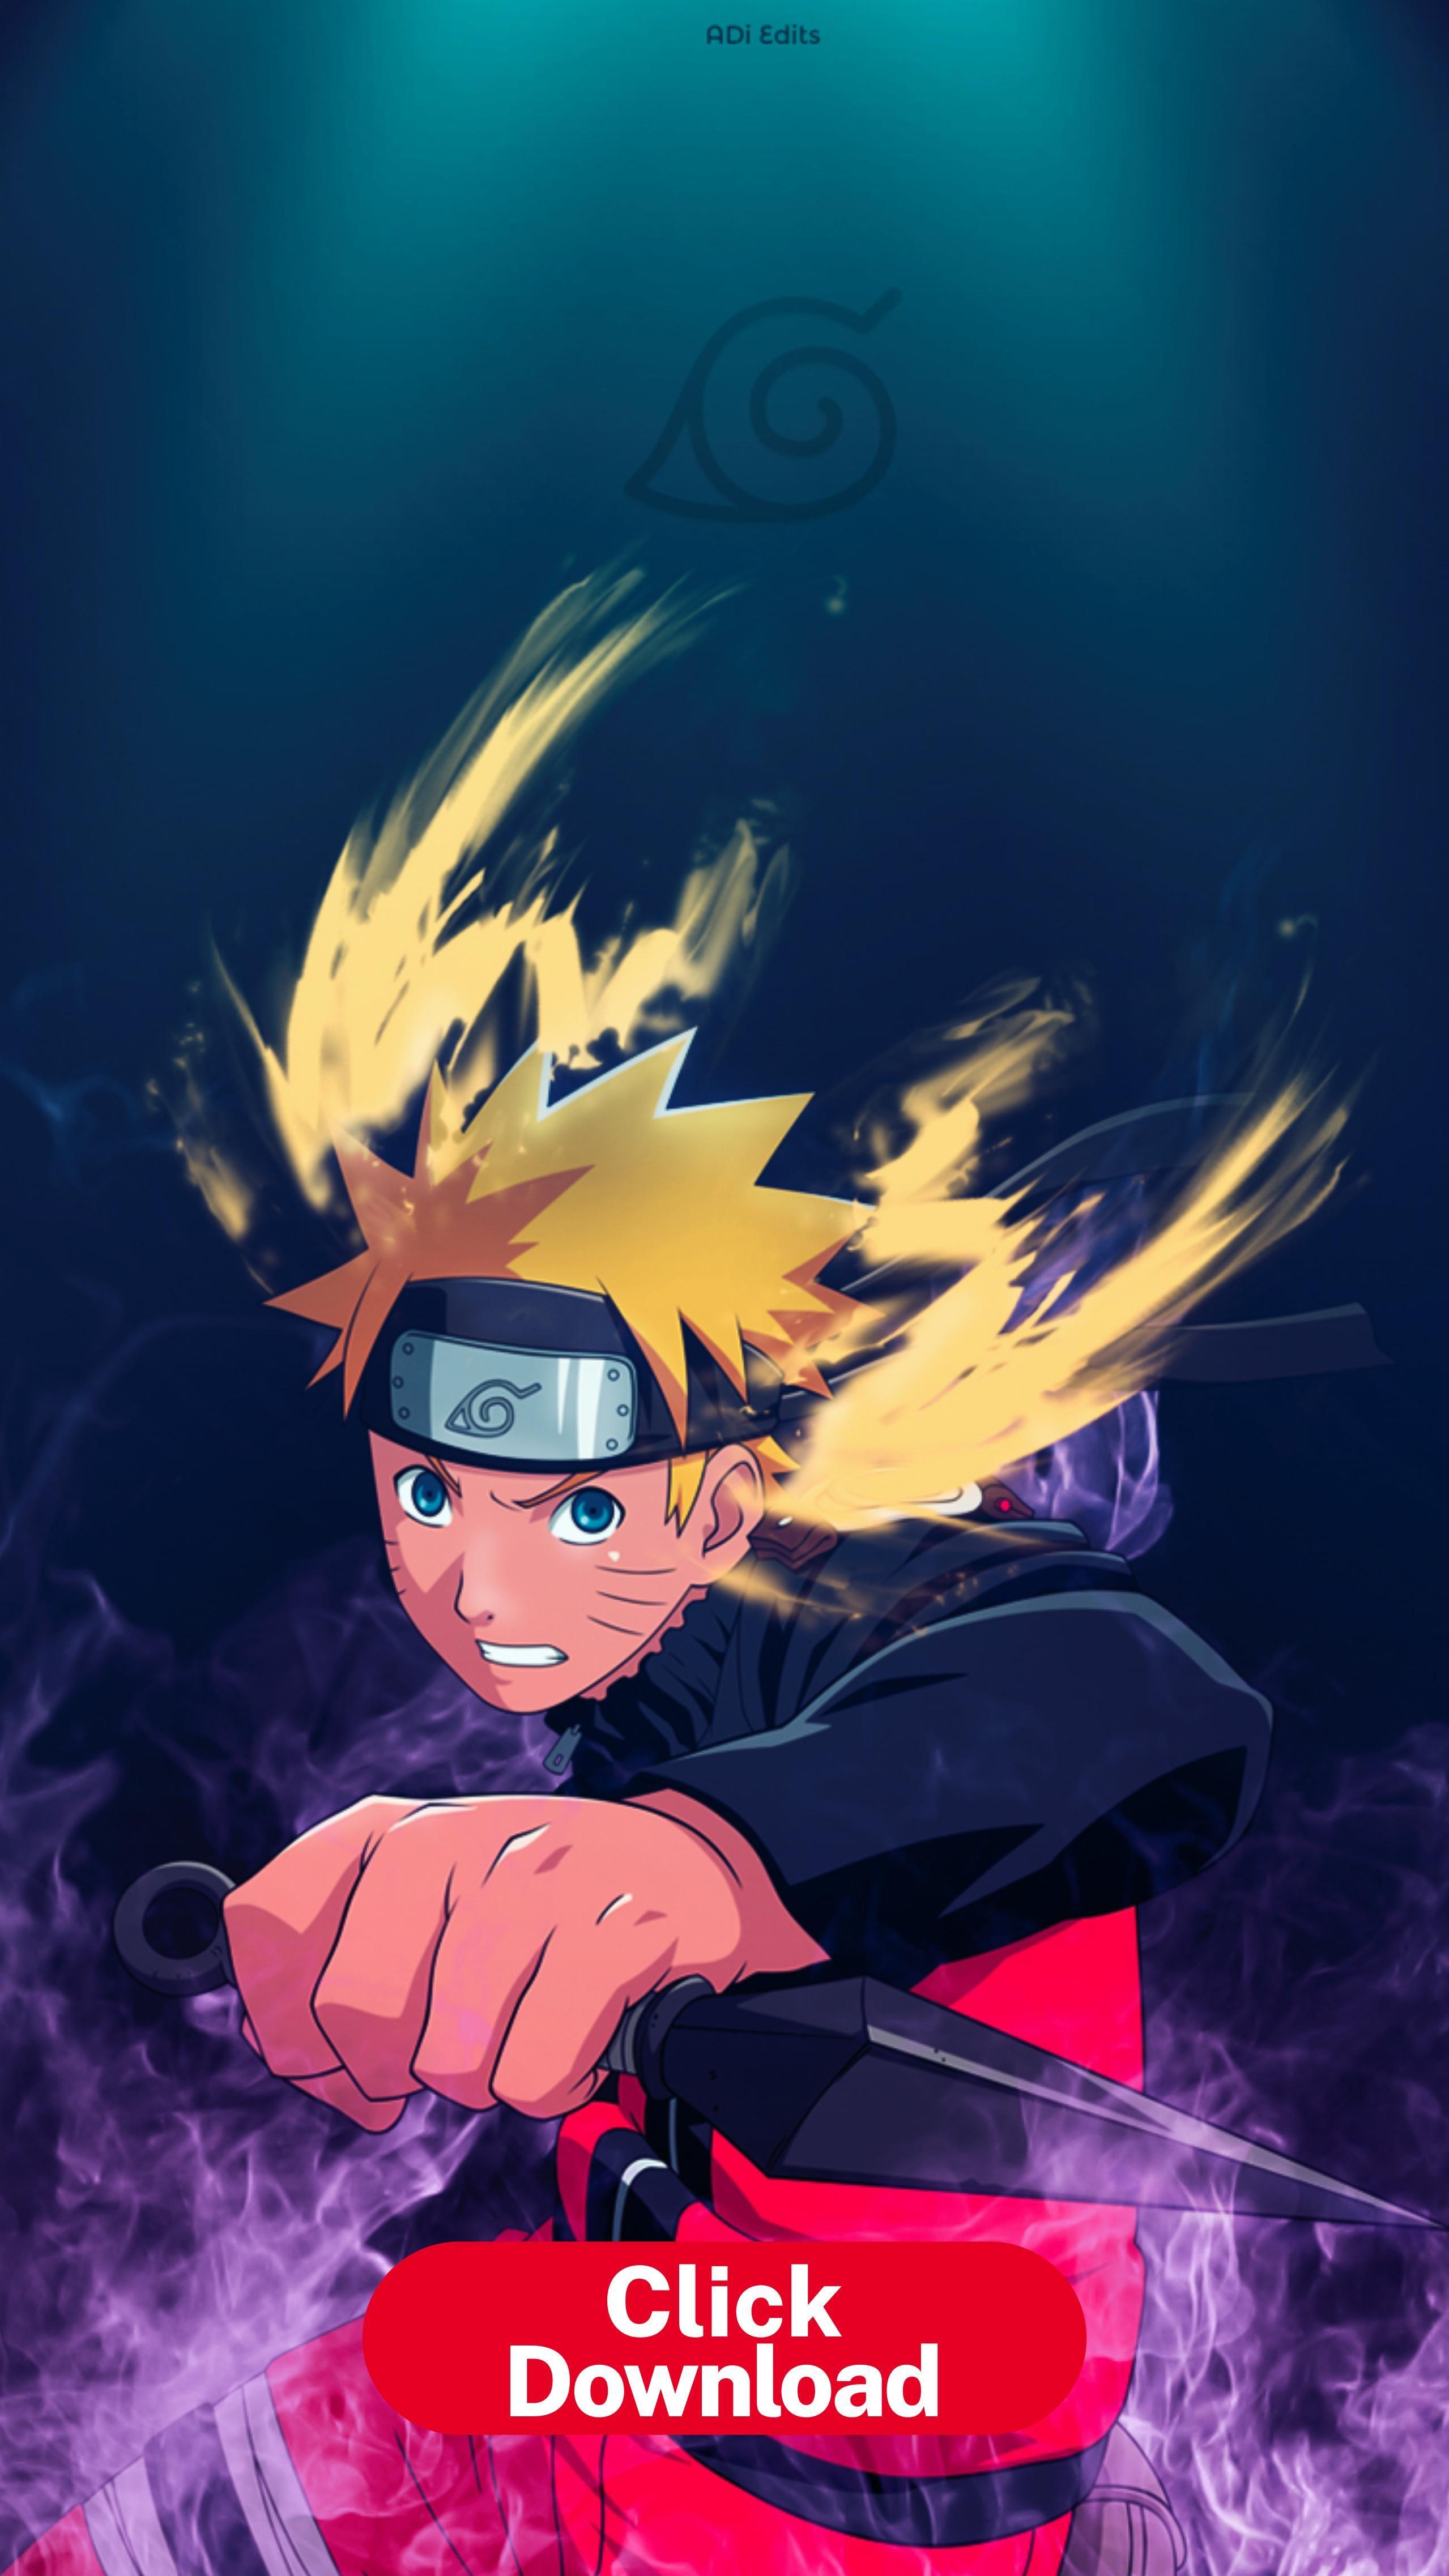 Naruto Mobile Wallpaper By Adi 149 On Deviantart Anime Anime Wallpaper Hd Anime Wallpapers